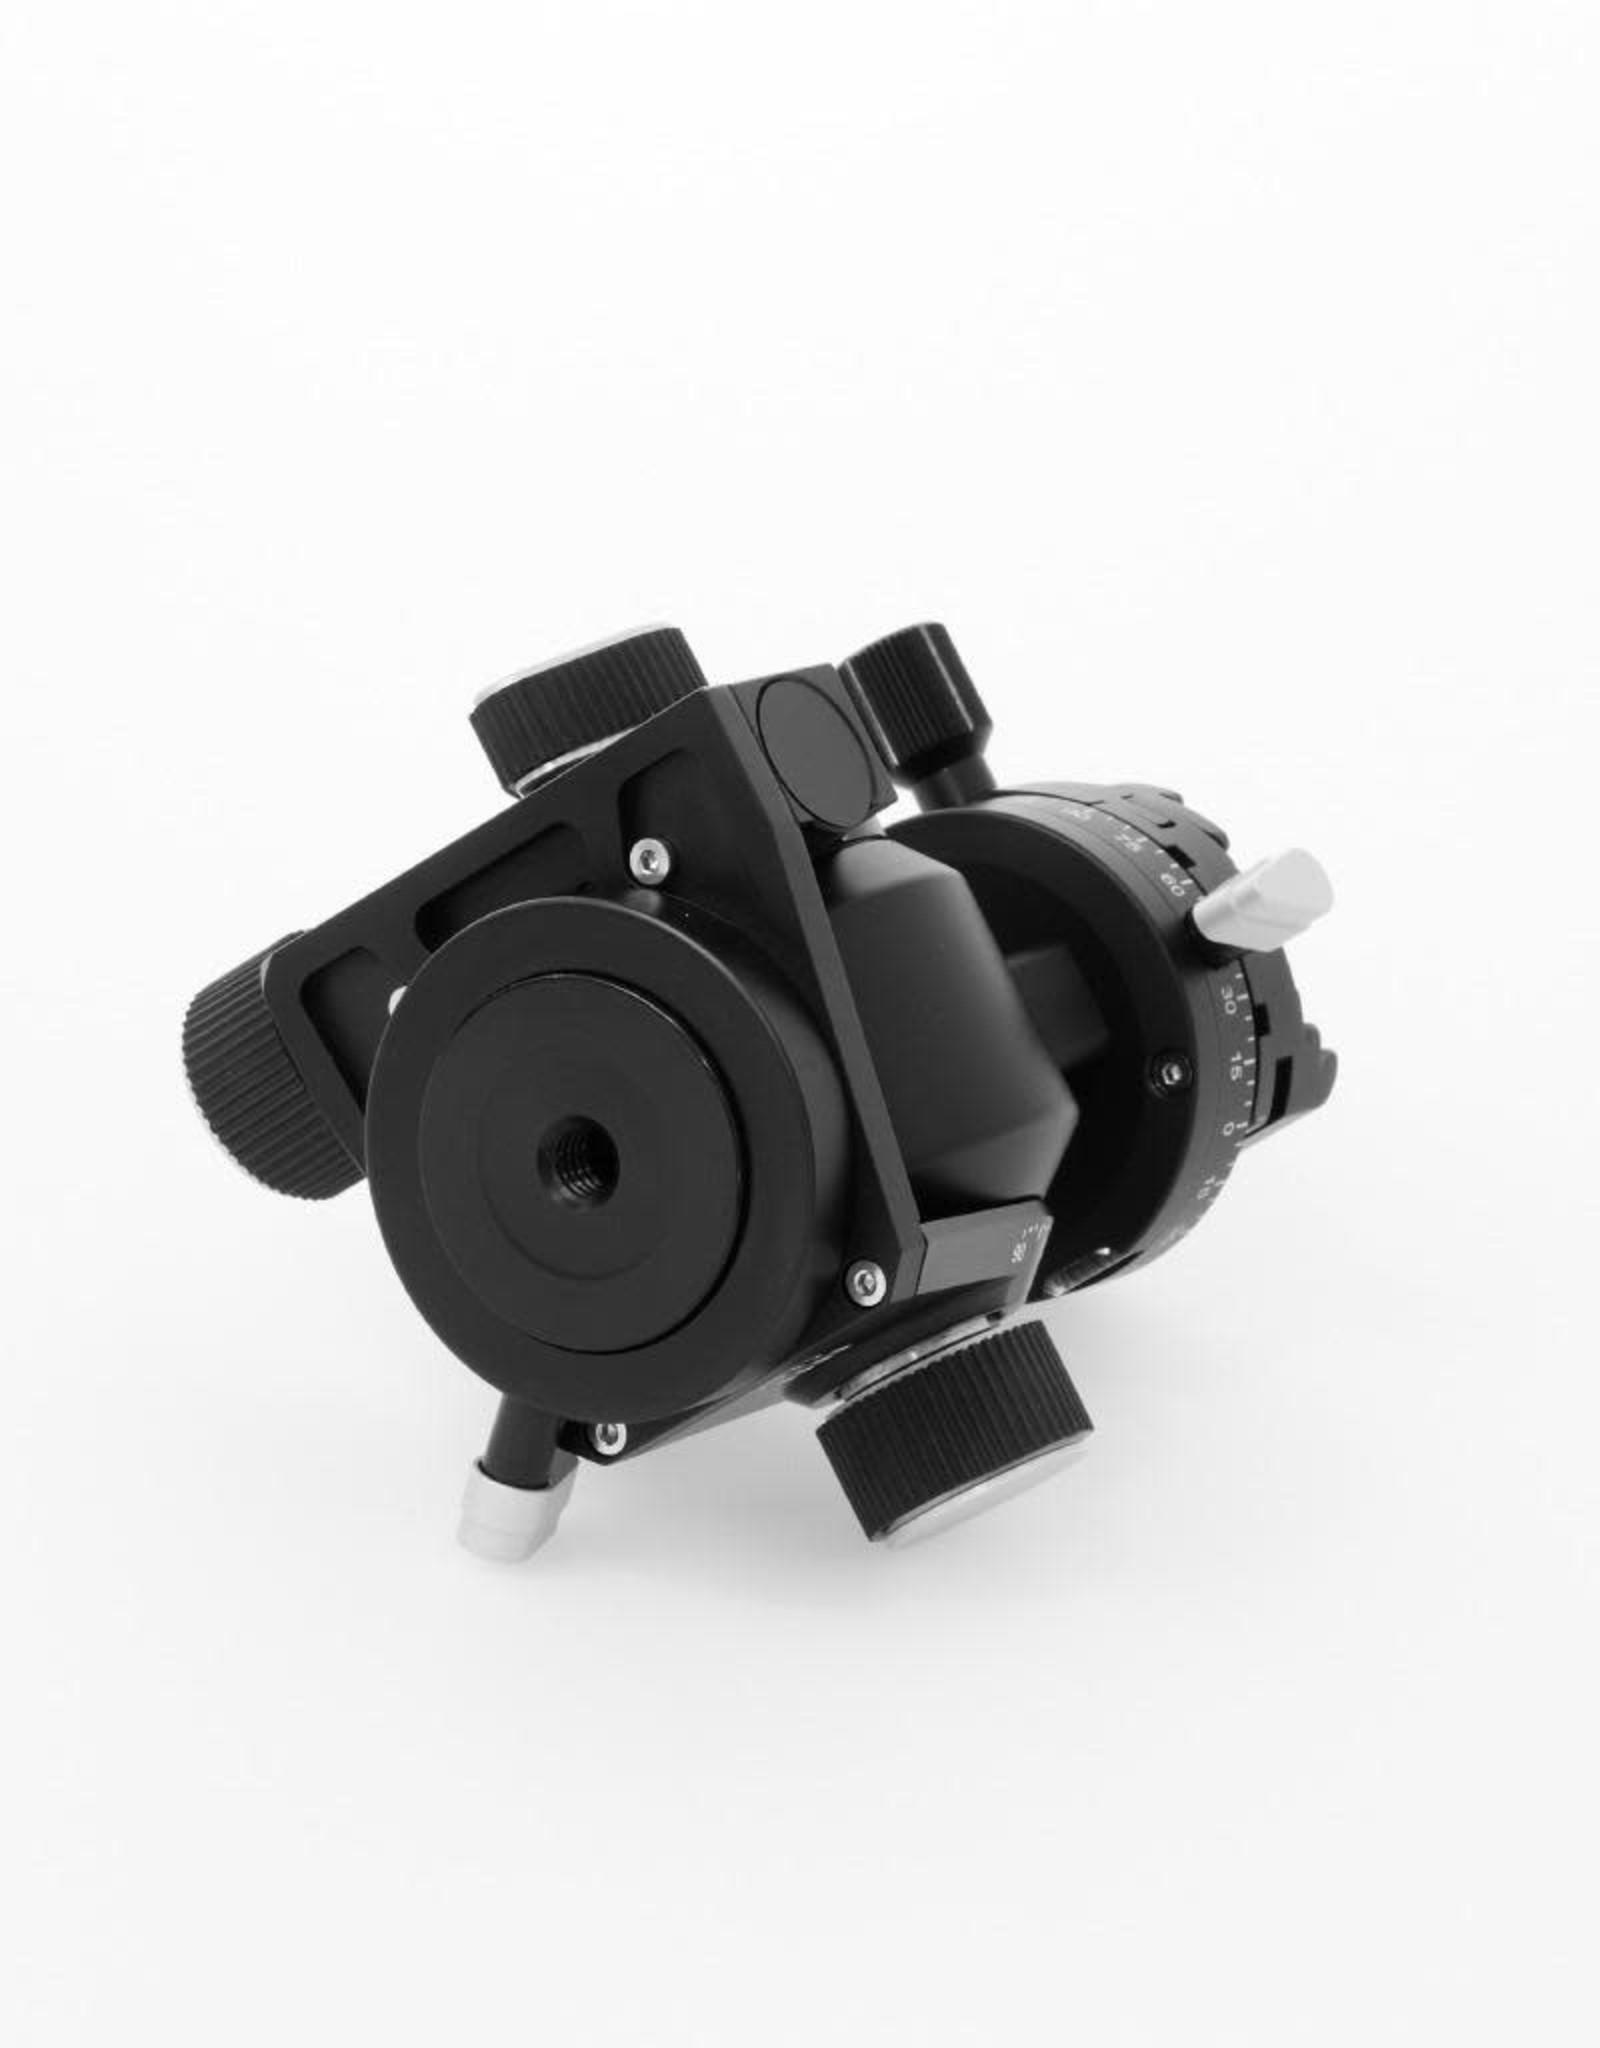 Arca Swiss Arca Swiss D4 (geared) quick set device Classic